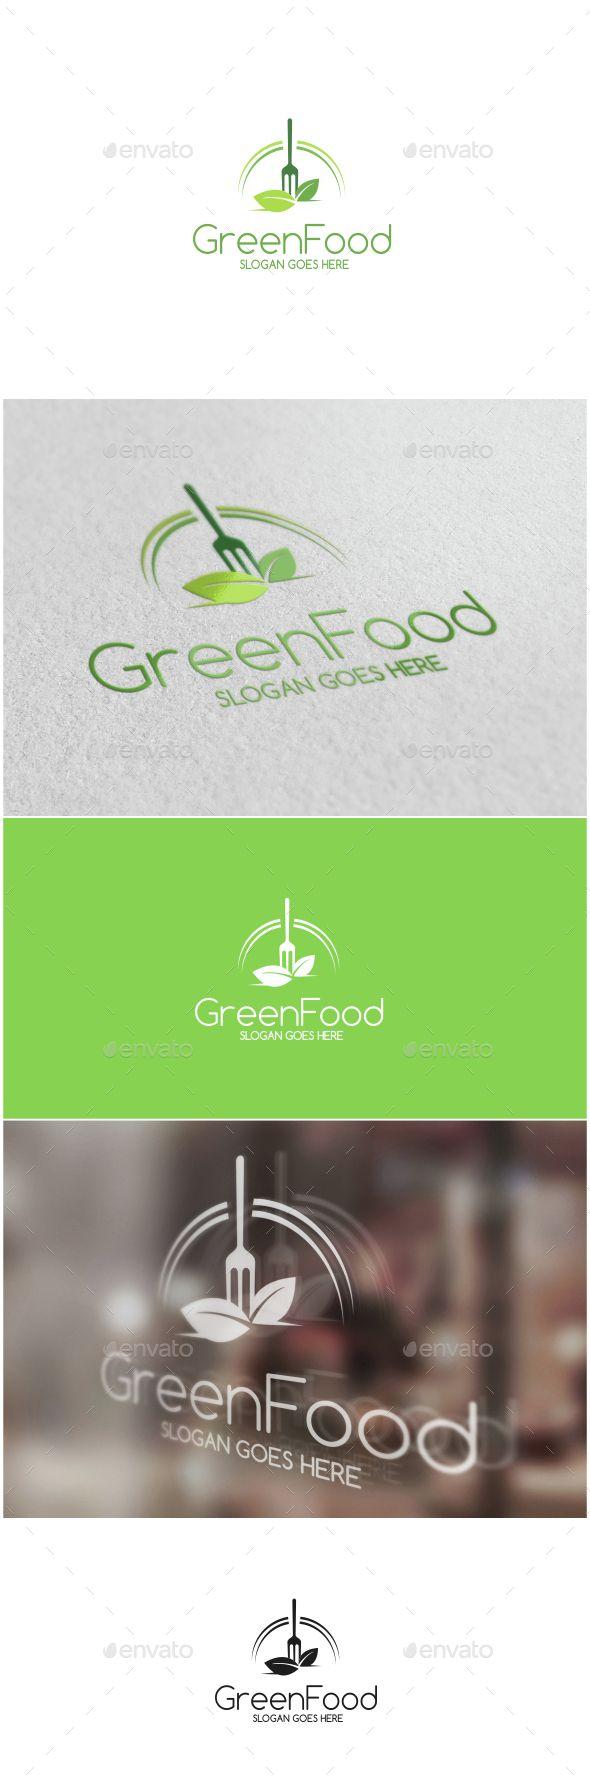 Green Food Logo Template Vector EPS, AI Illustrator. Download here: http://graphicriver.net/item/green-food-logo/15249521?ref=ksioks